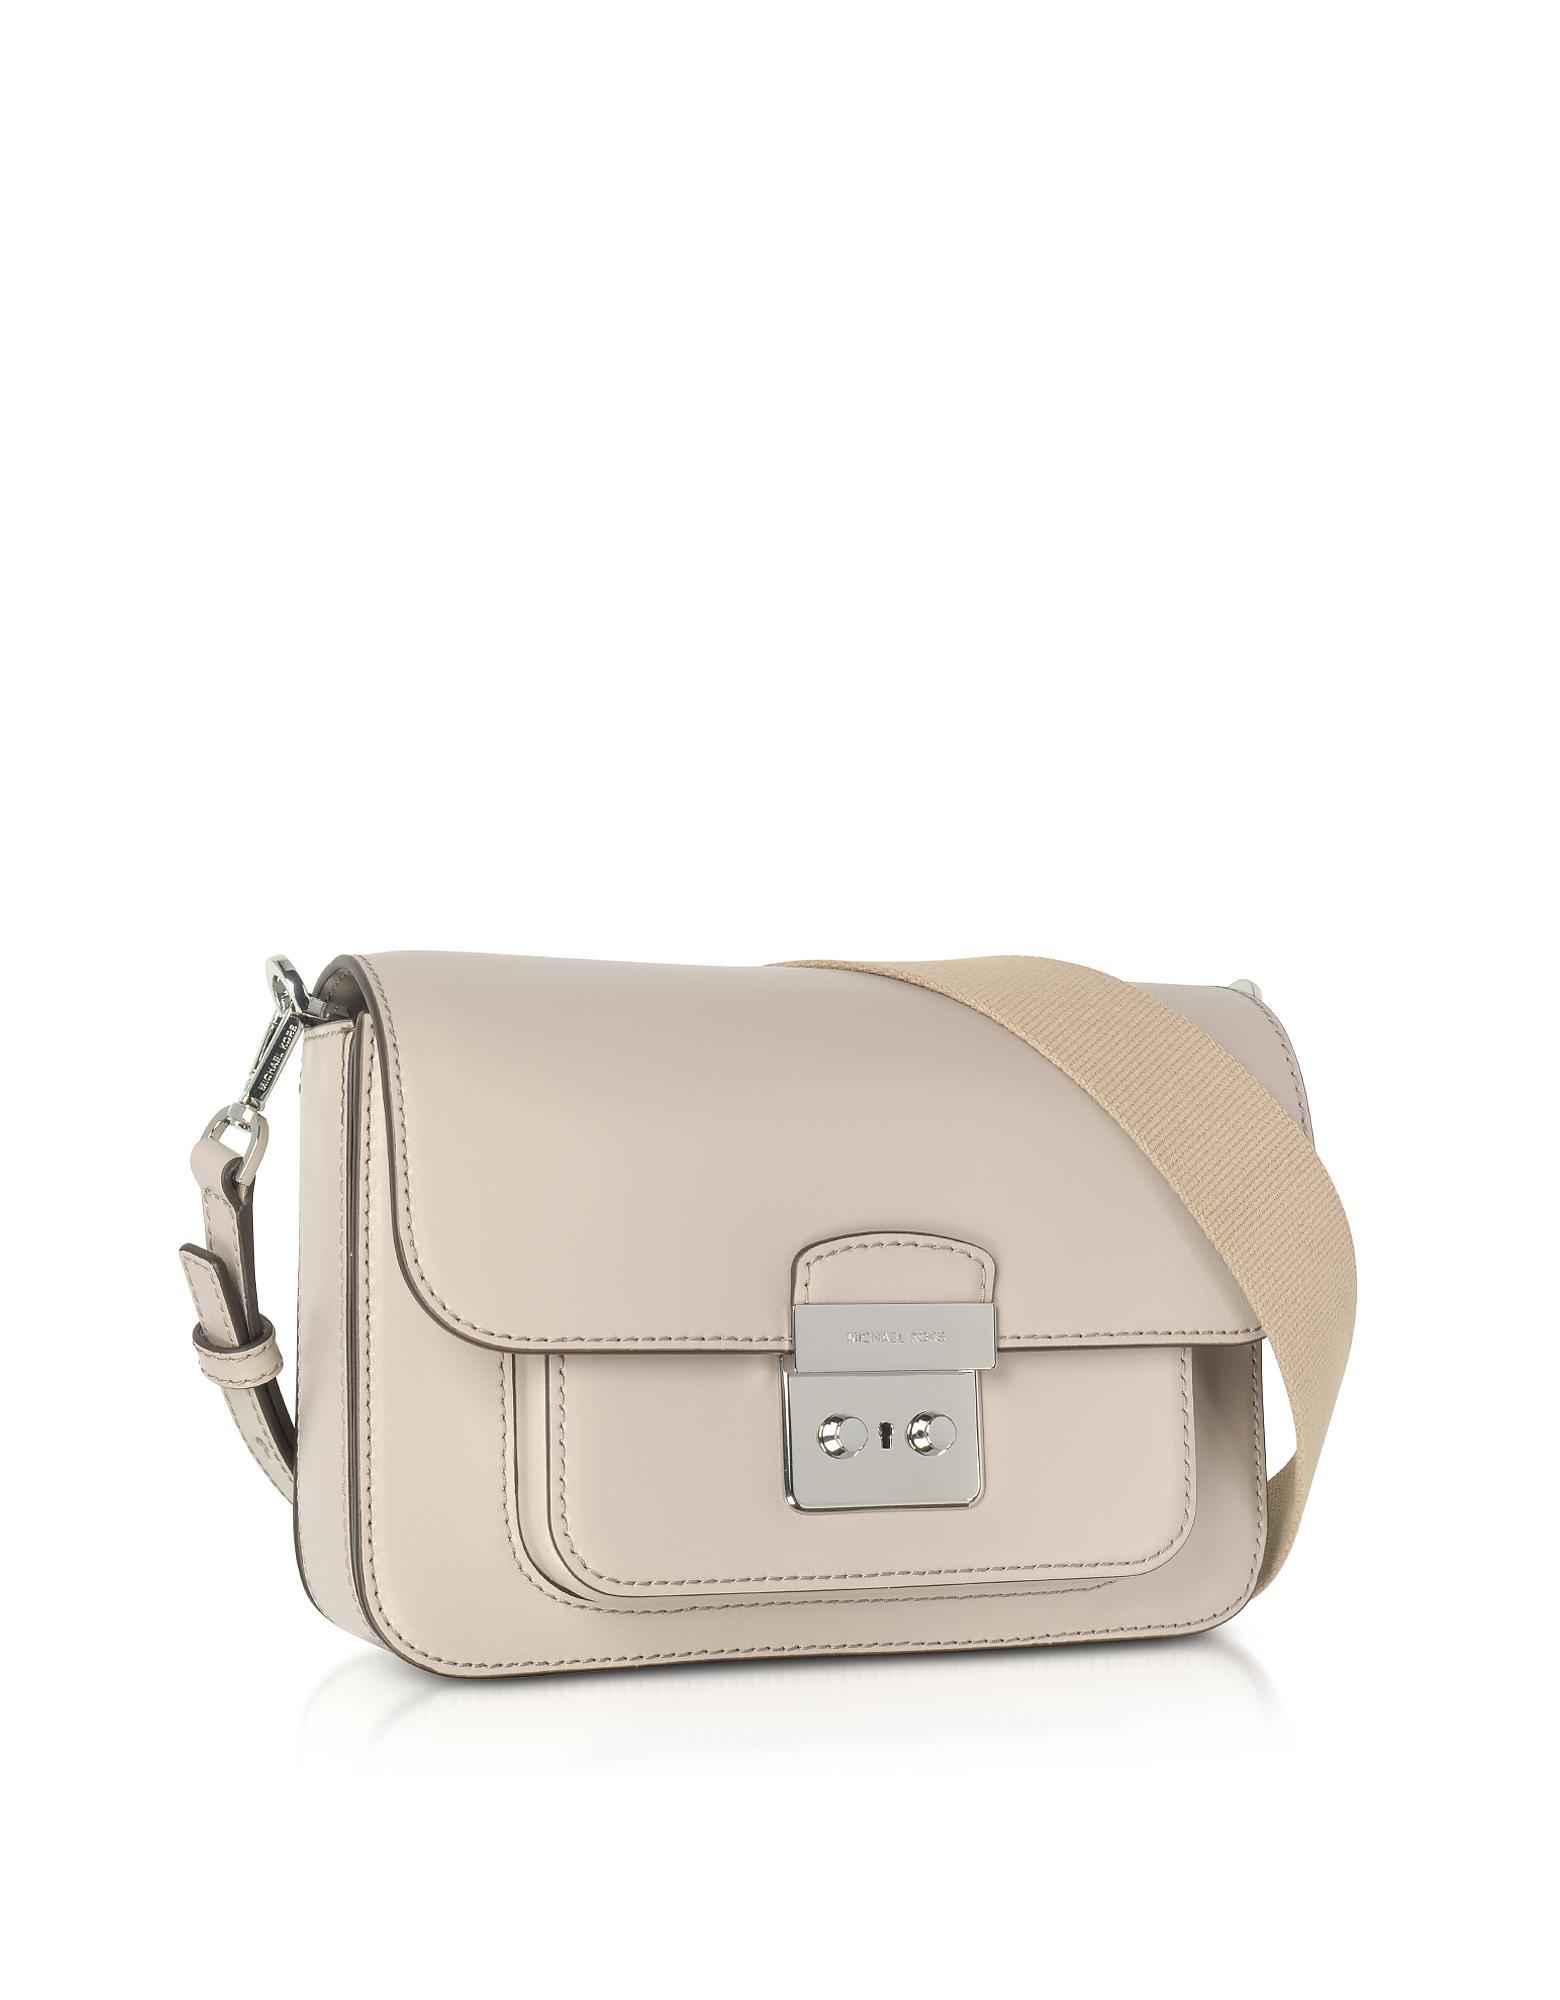 1aa0221058dc Lyst - Michael Kors Sloan Editor Large Cement Leather Shoulder Bag ...